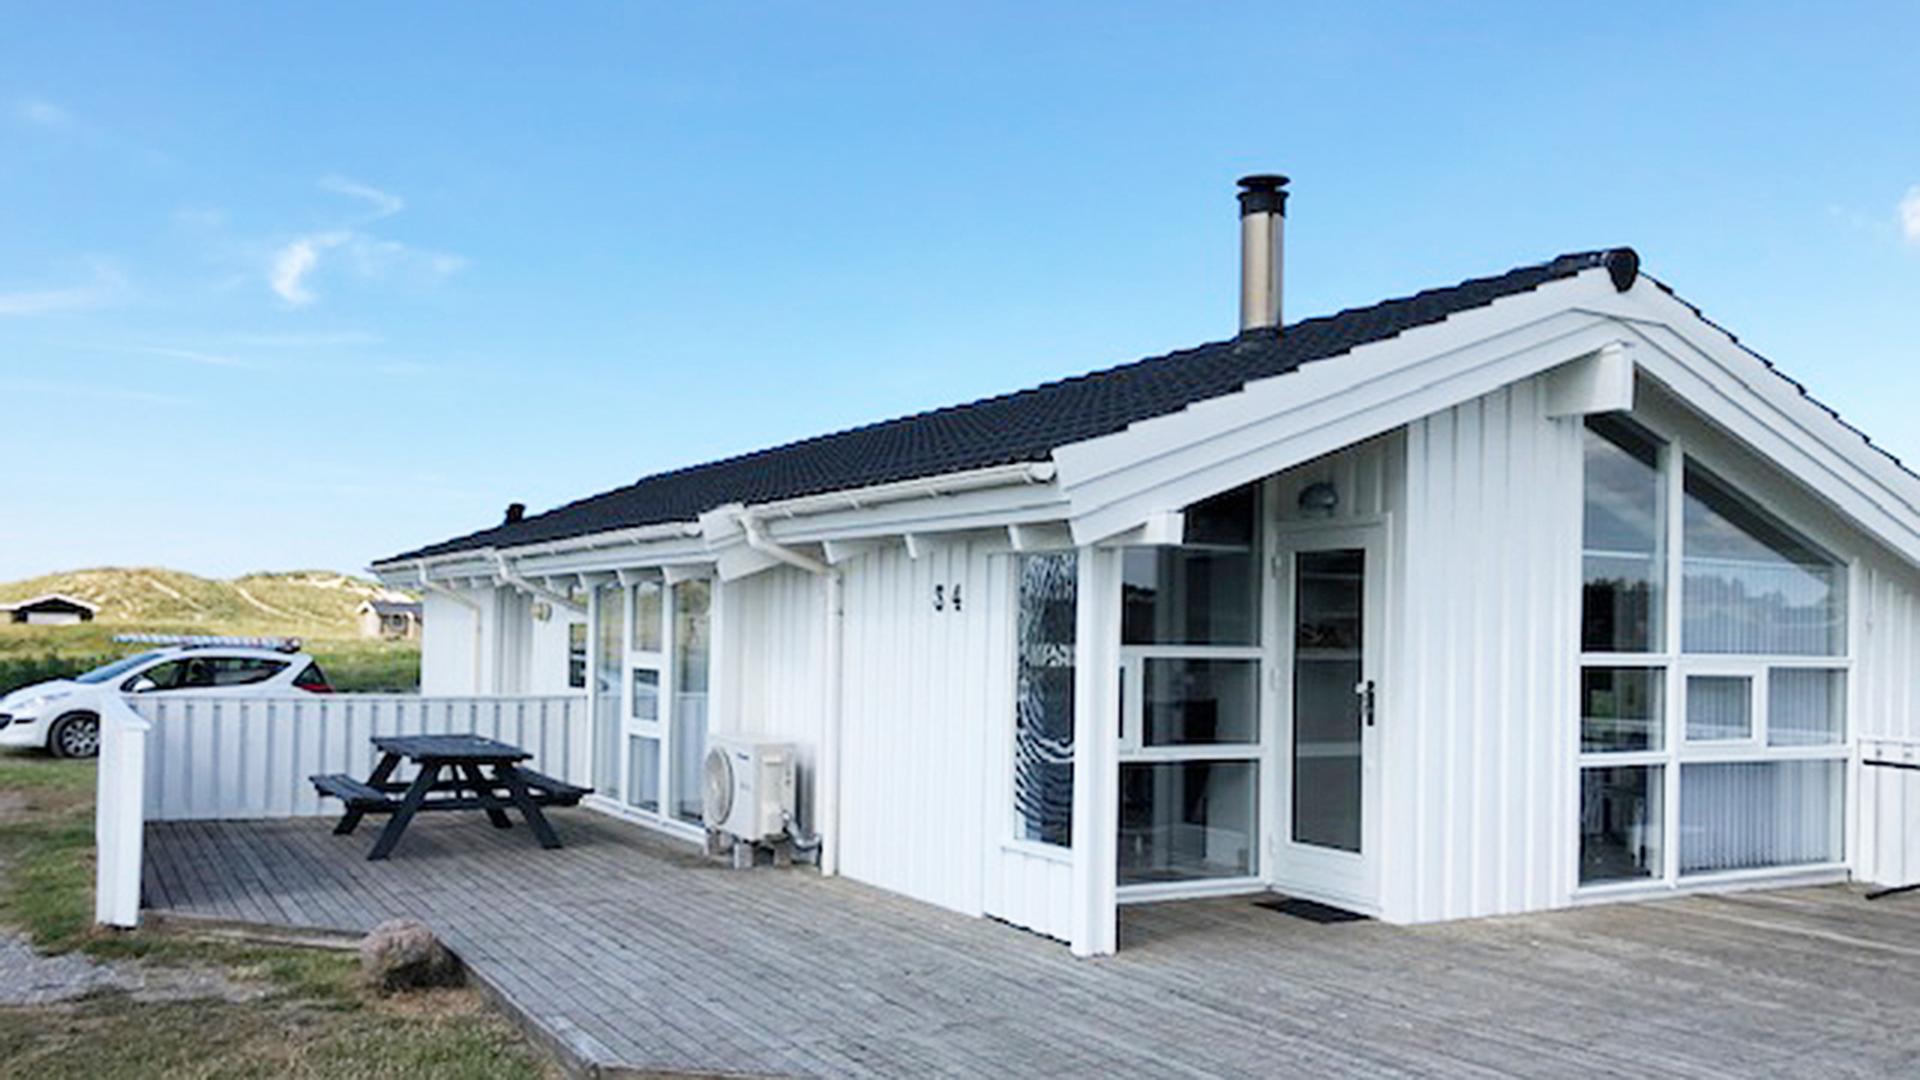 Nørlev Poolhus außen